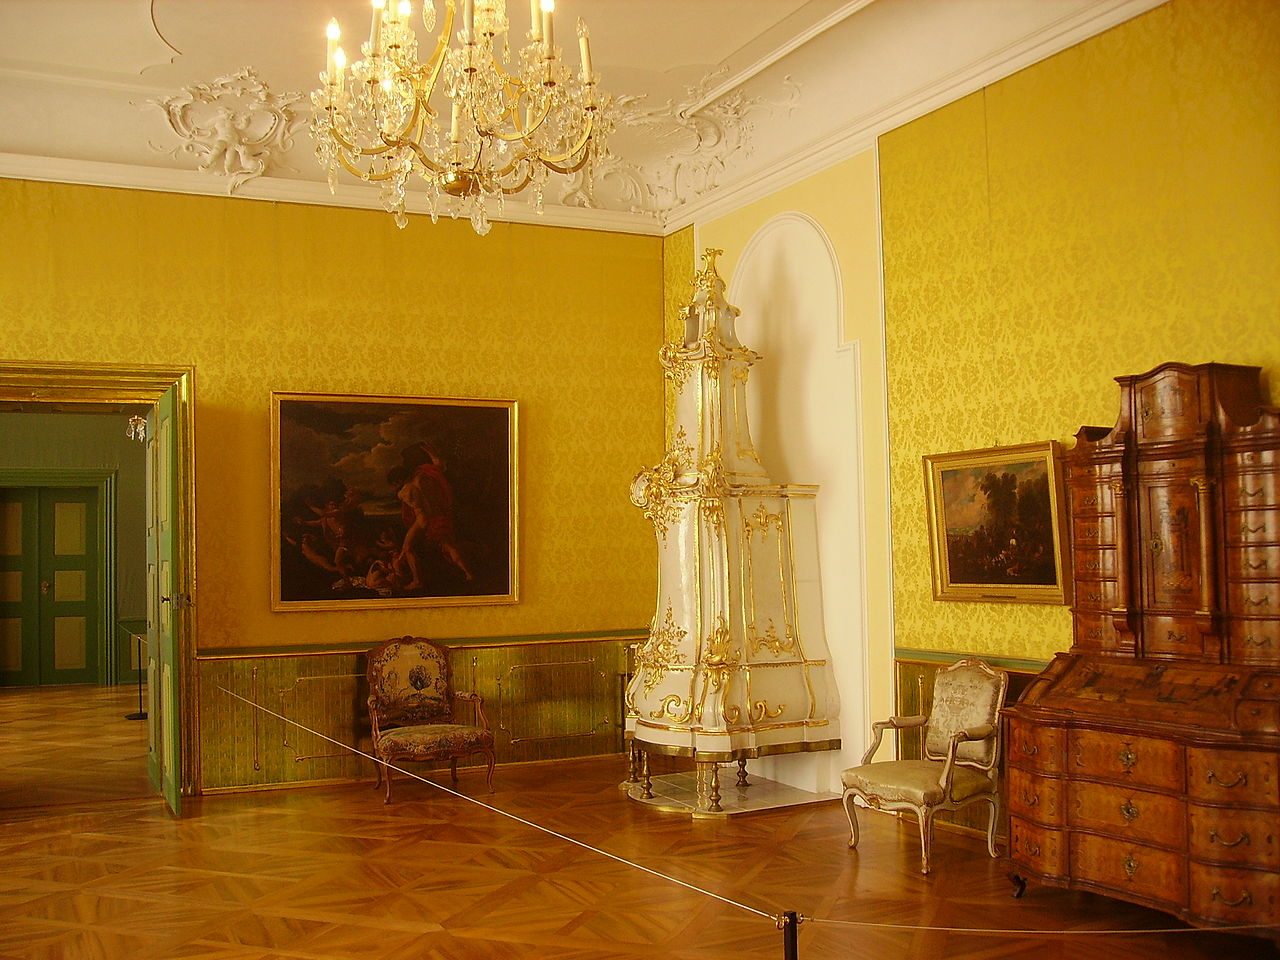 File:Tettnang Neues Schloss Innen Fürstenzimmer 2.JPG - Wikimedia ...